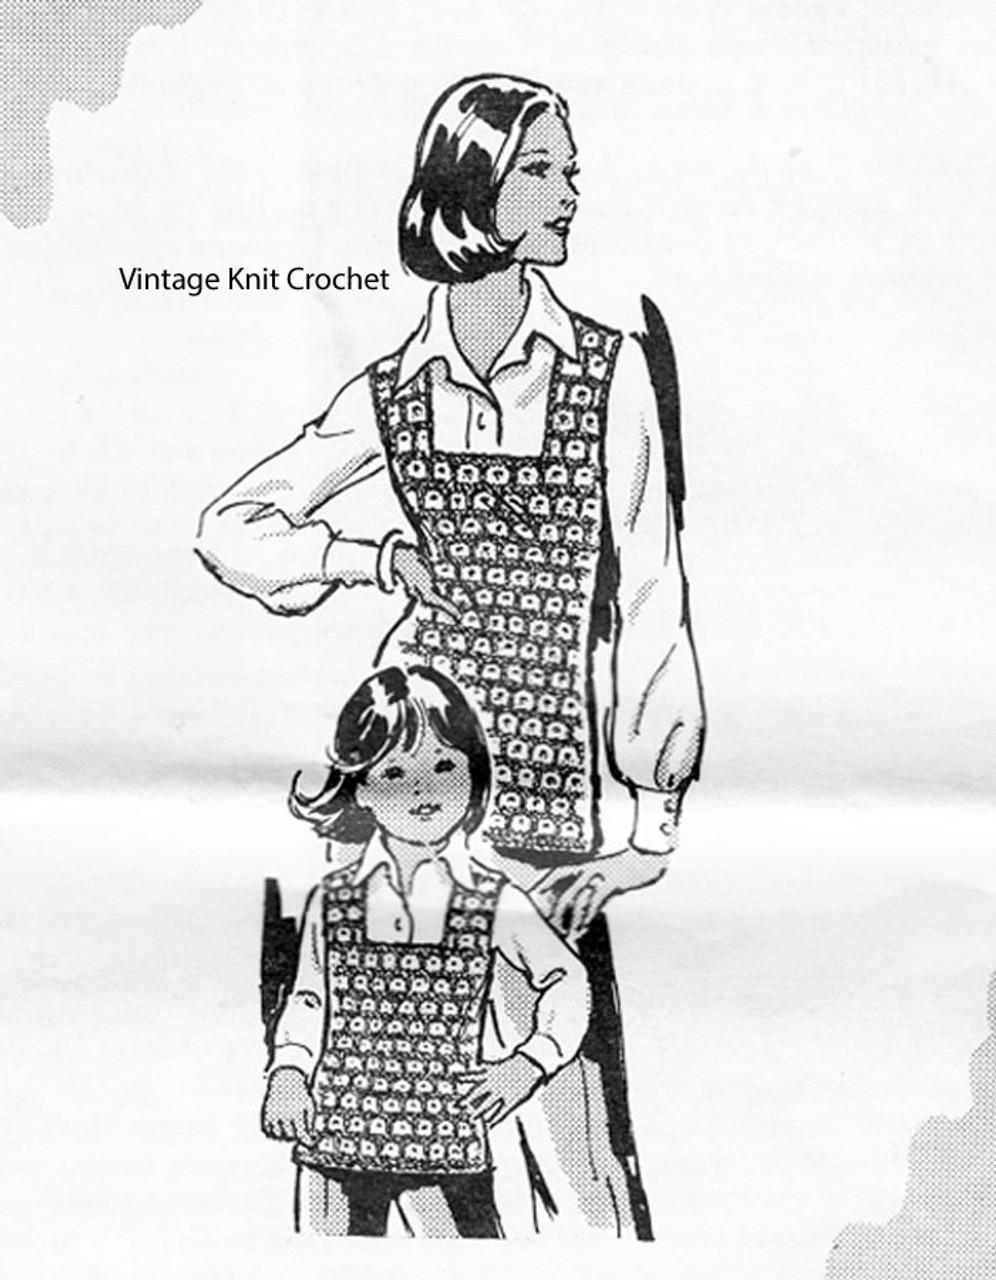 Girls Broomstick Lace Top Crochet Pattern Design 852